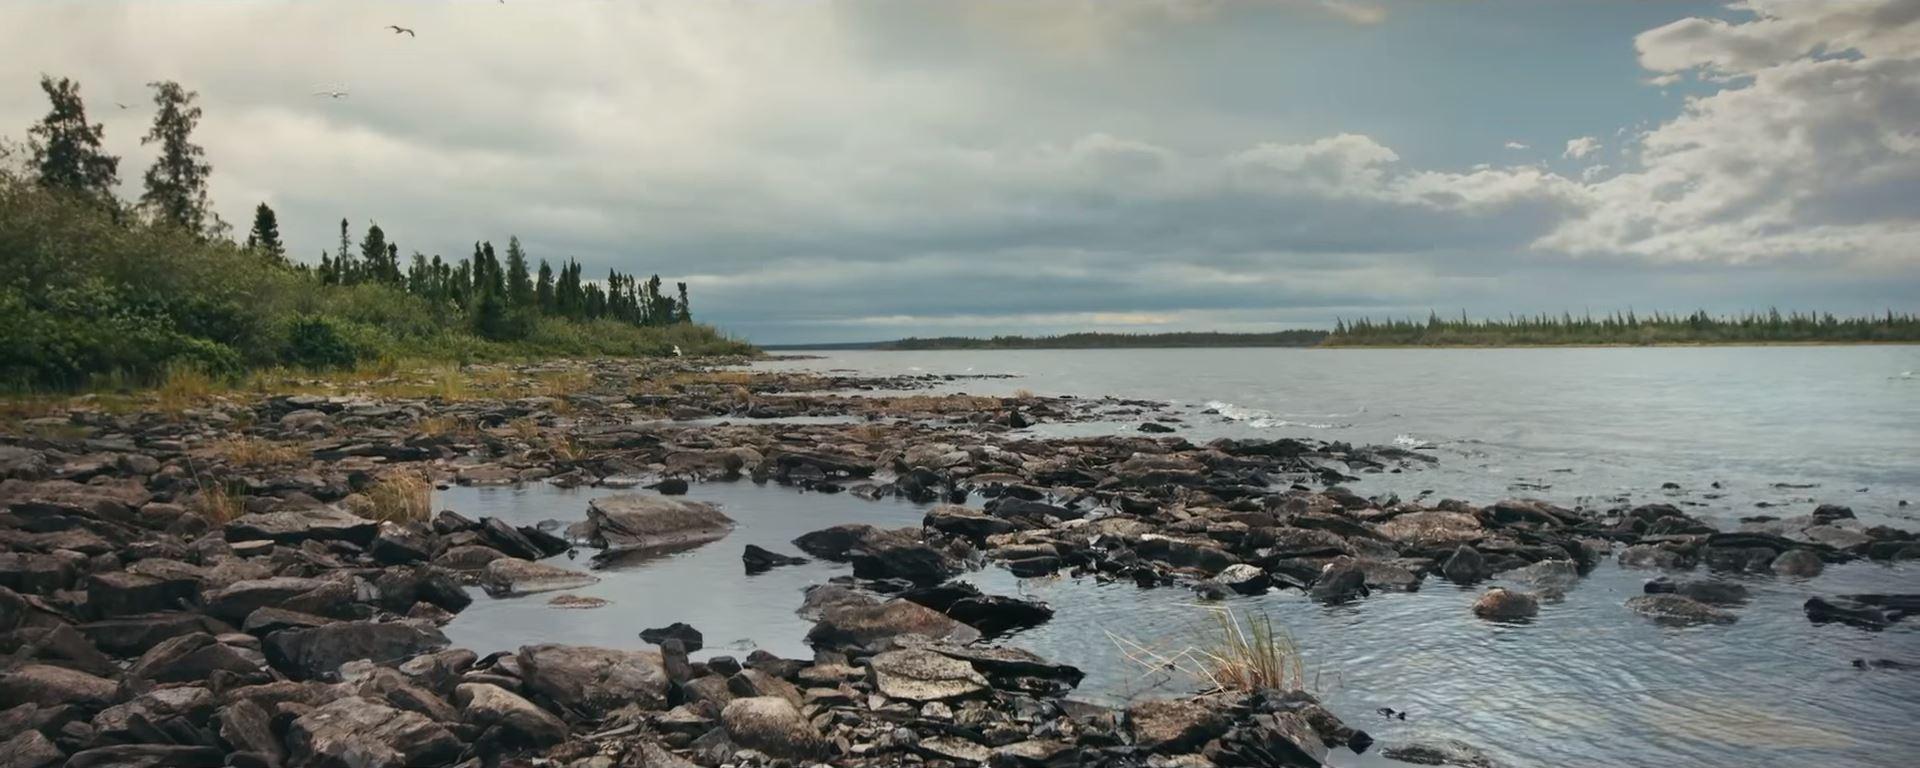 Canada fishing lodge canada fishing lodges canada for Canadian fishing lodges